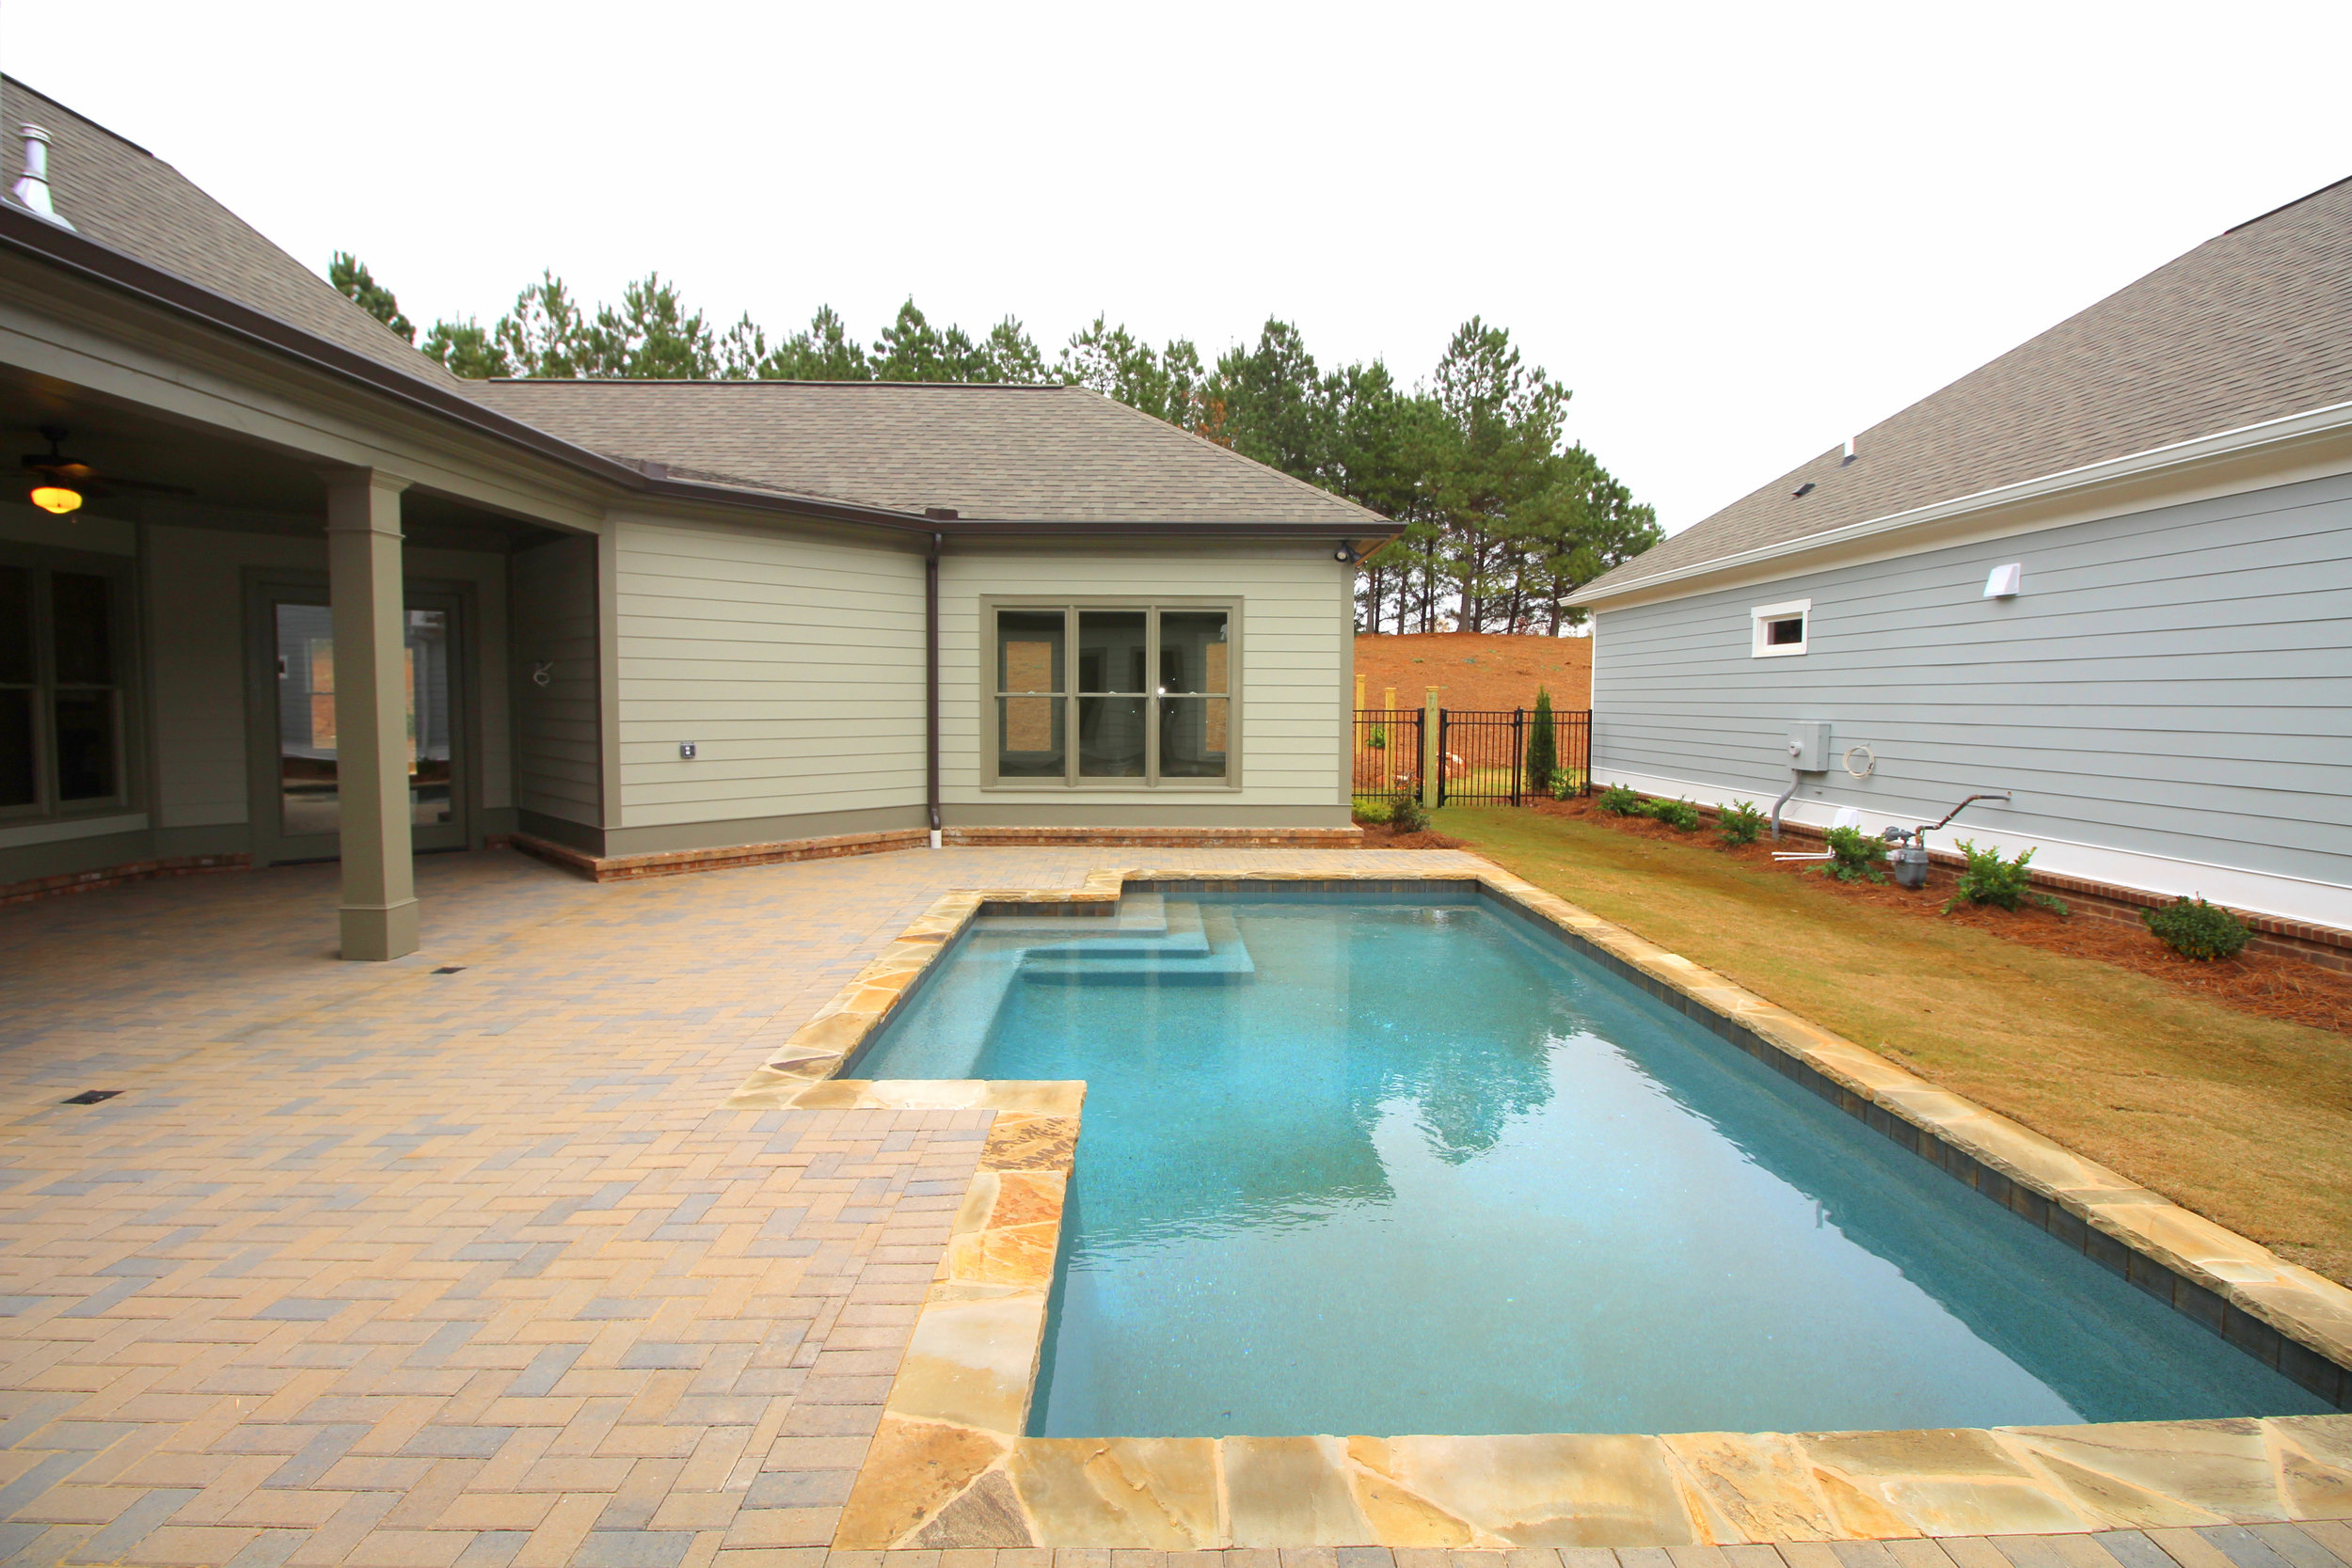 rock-trimmed-paver-pool-edge-1756-greenleffe-drive-statham-ga-30666-the-georgia-club-oconee-county-oconee-springs-athens-area-home-for-sale-courtyard-homes.JPG